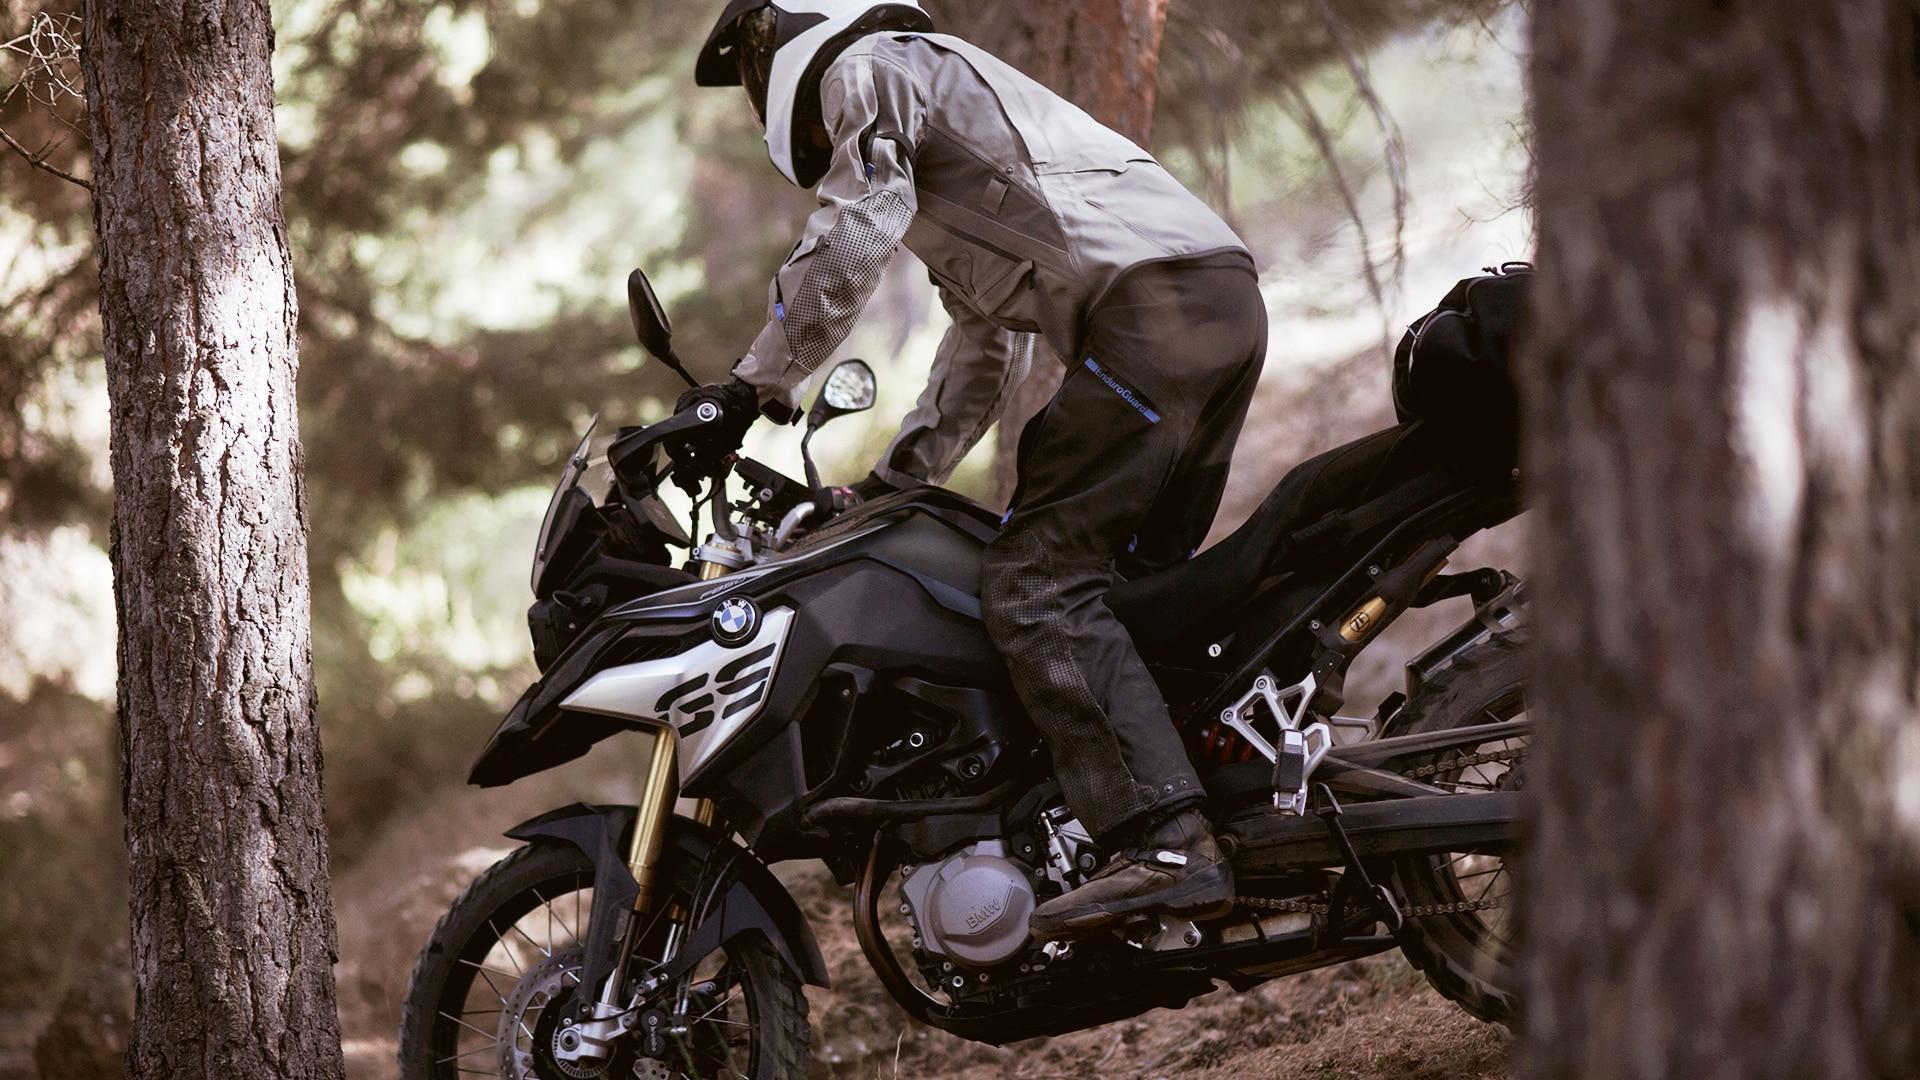 adf330d7893 Home | BMW Motorrad